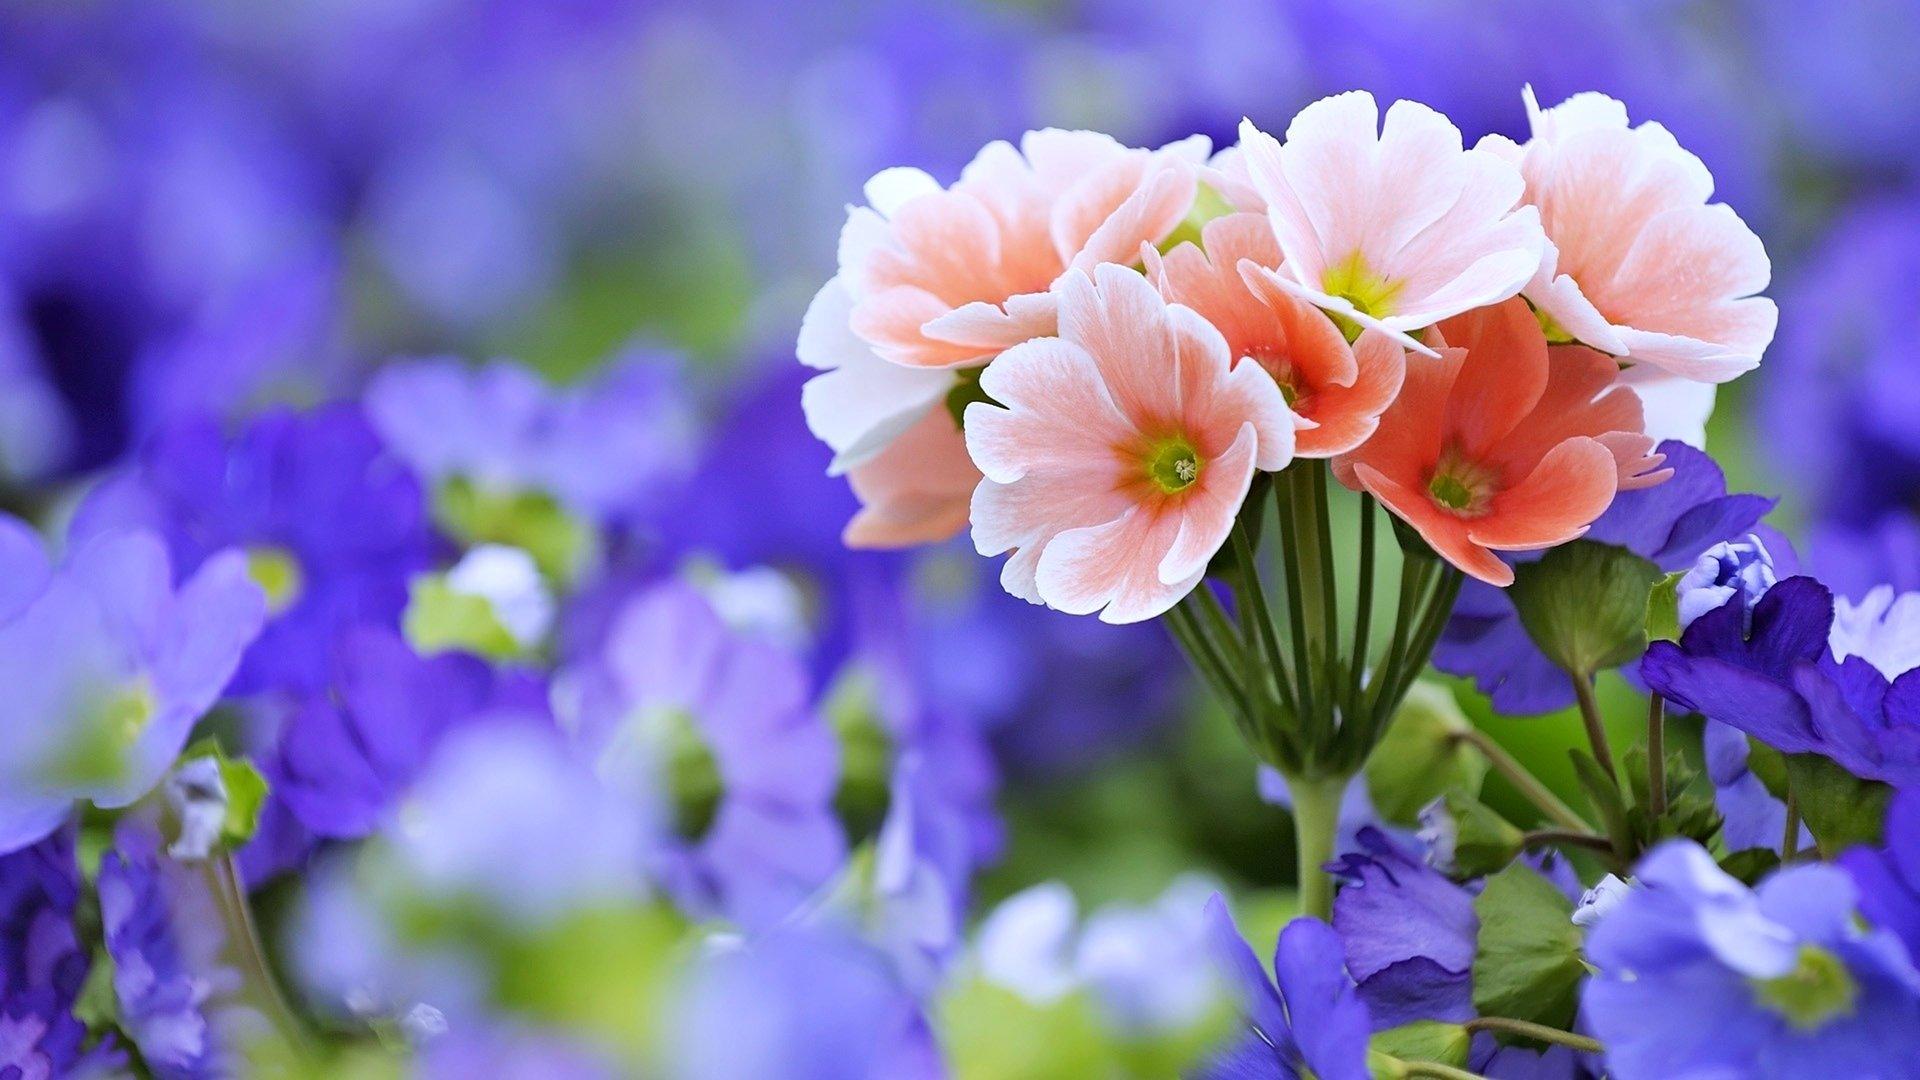 fond d écran hd fleurs